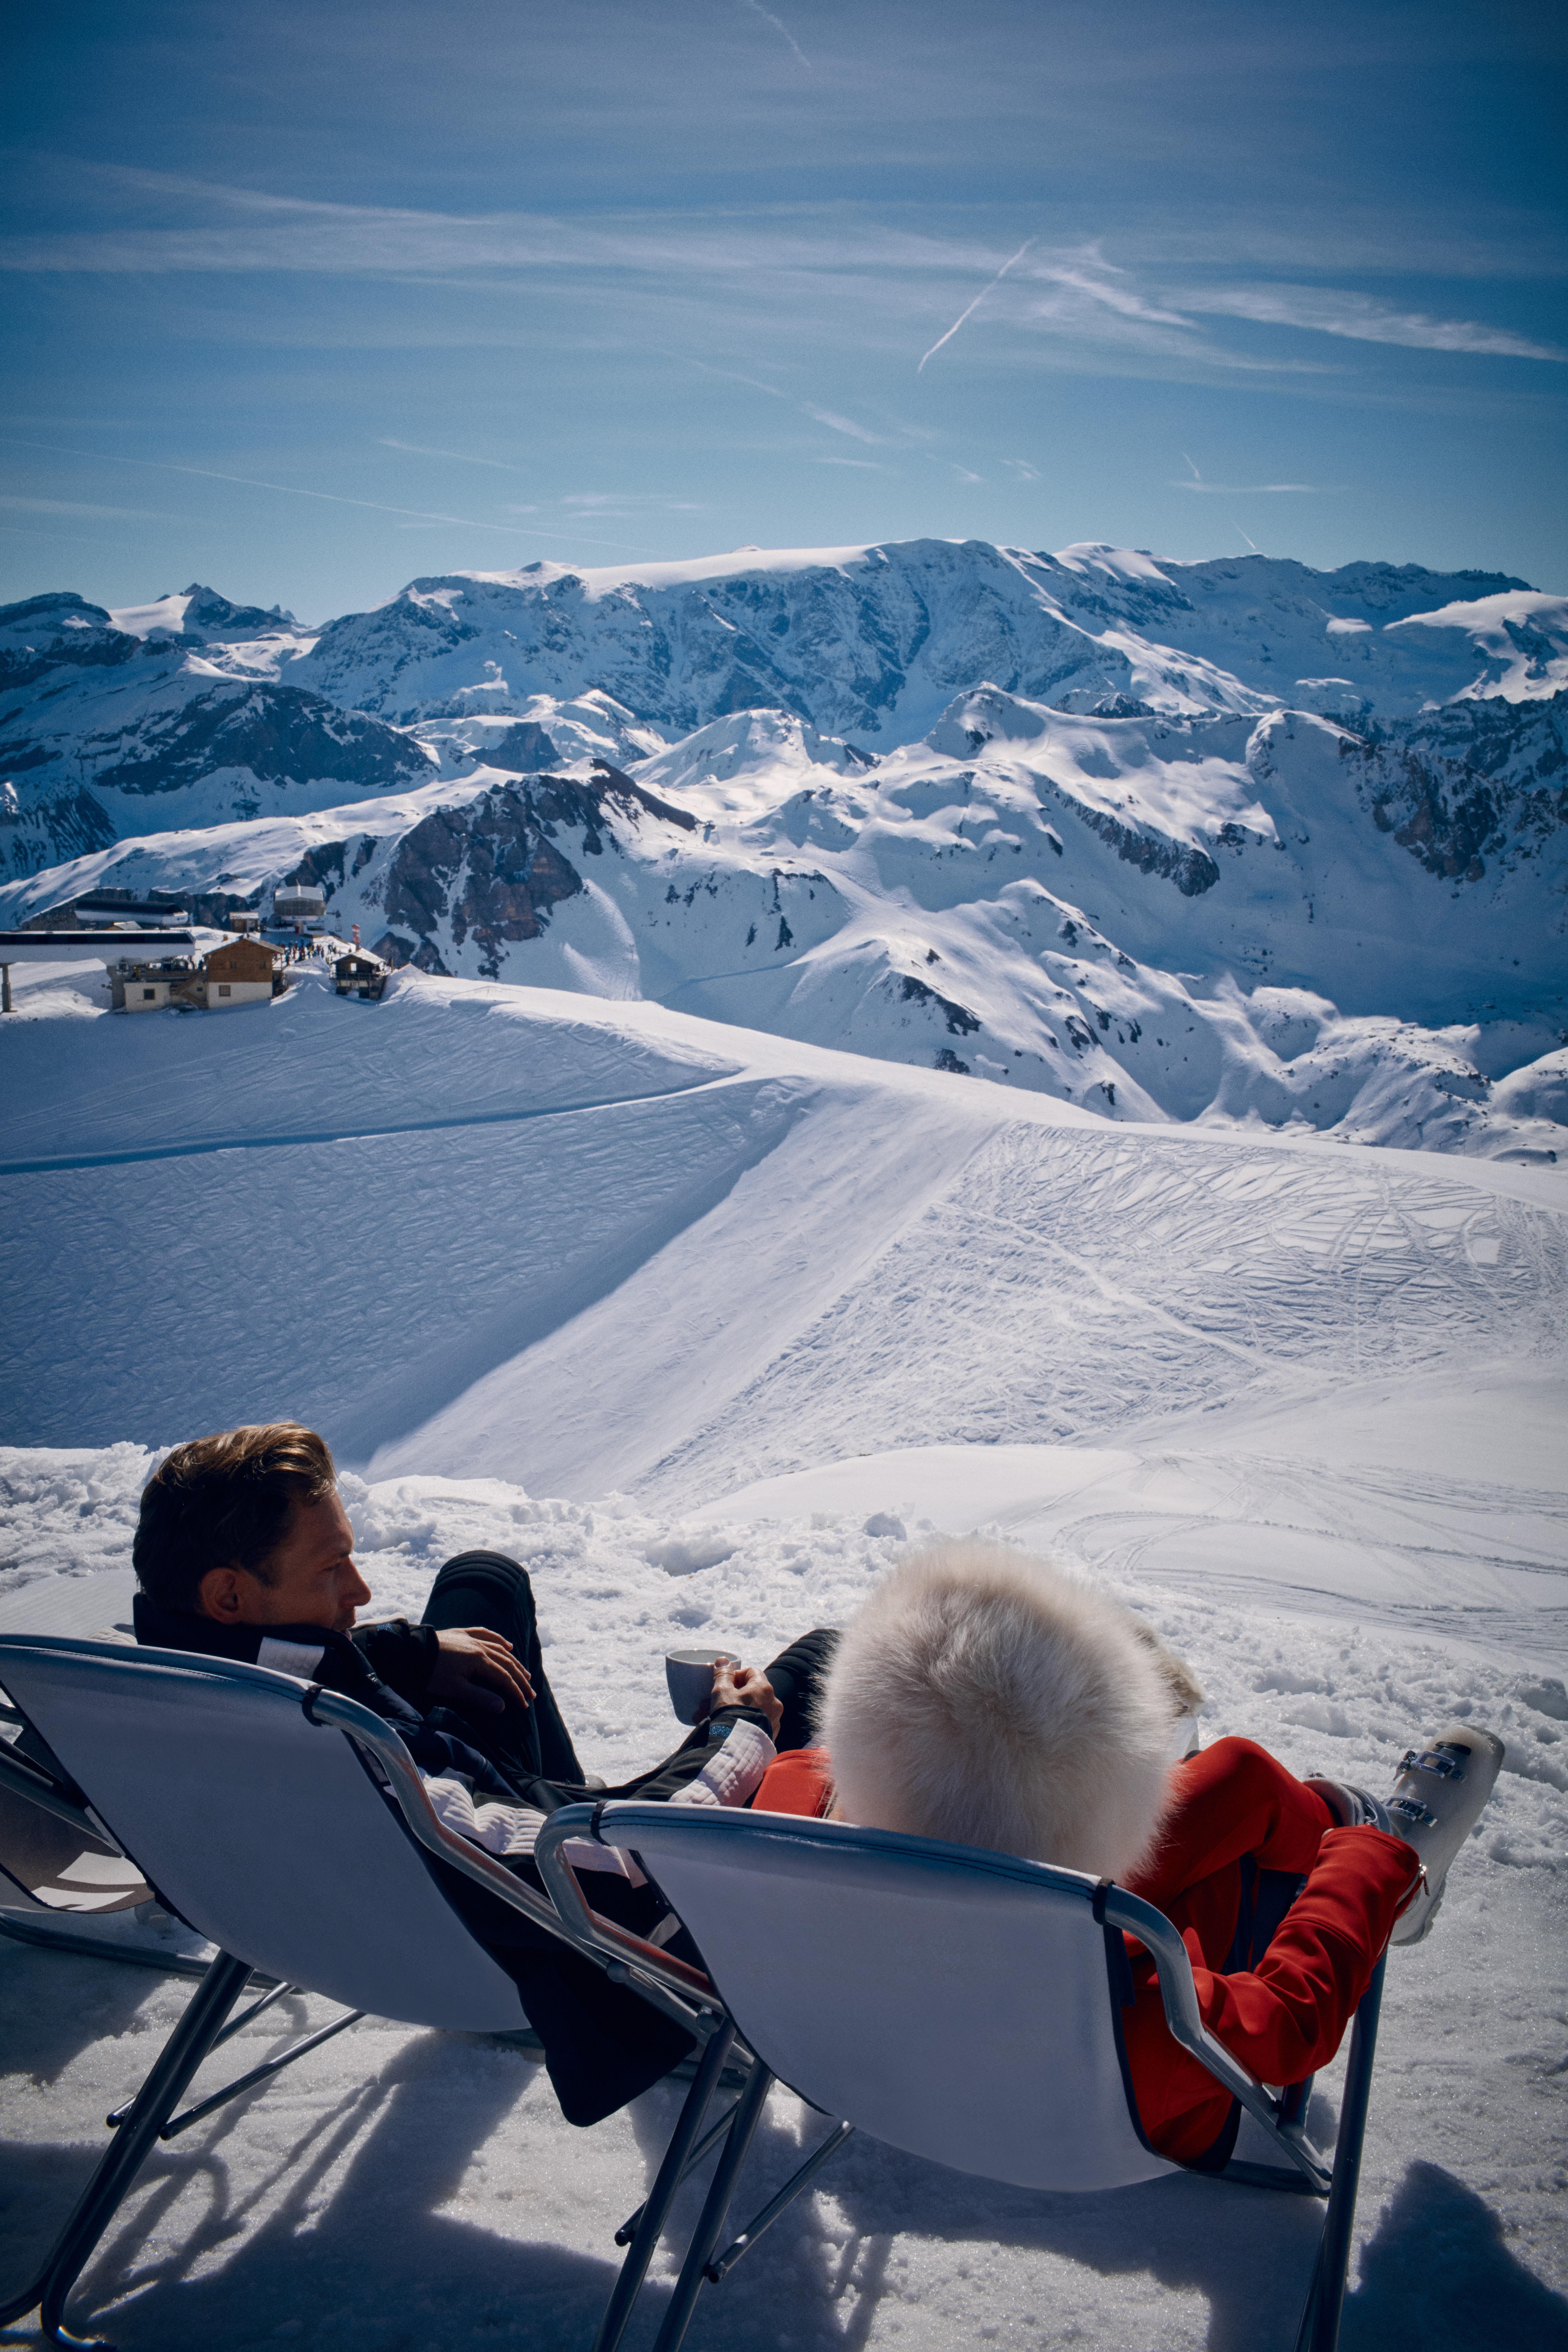 Ski_slopes_8115